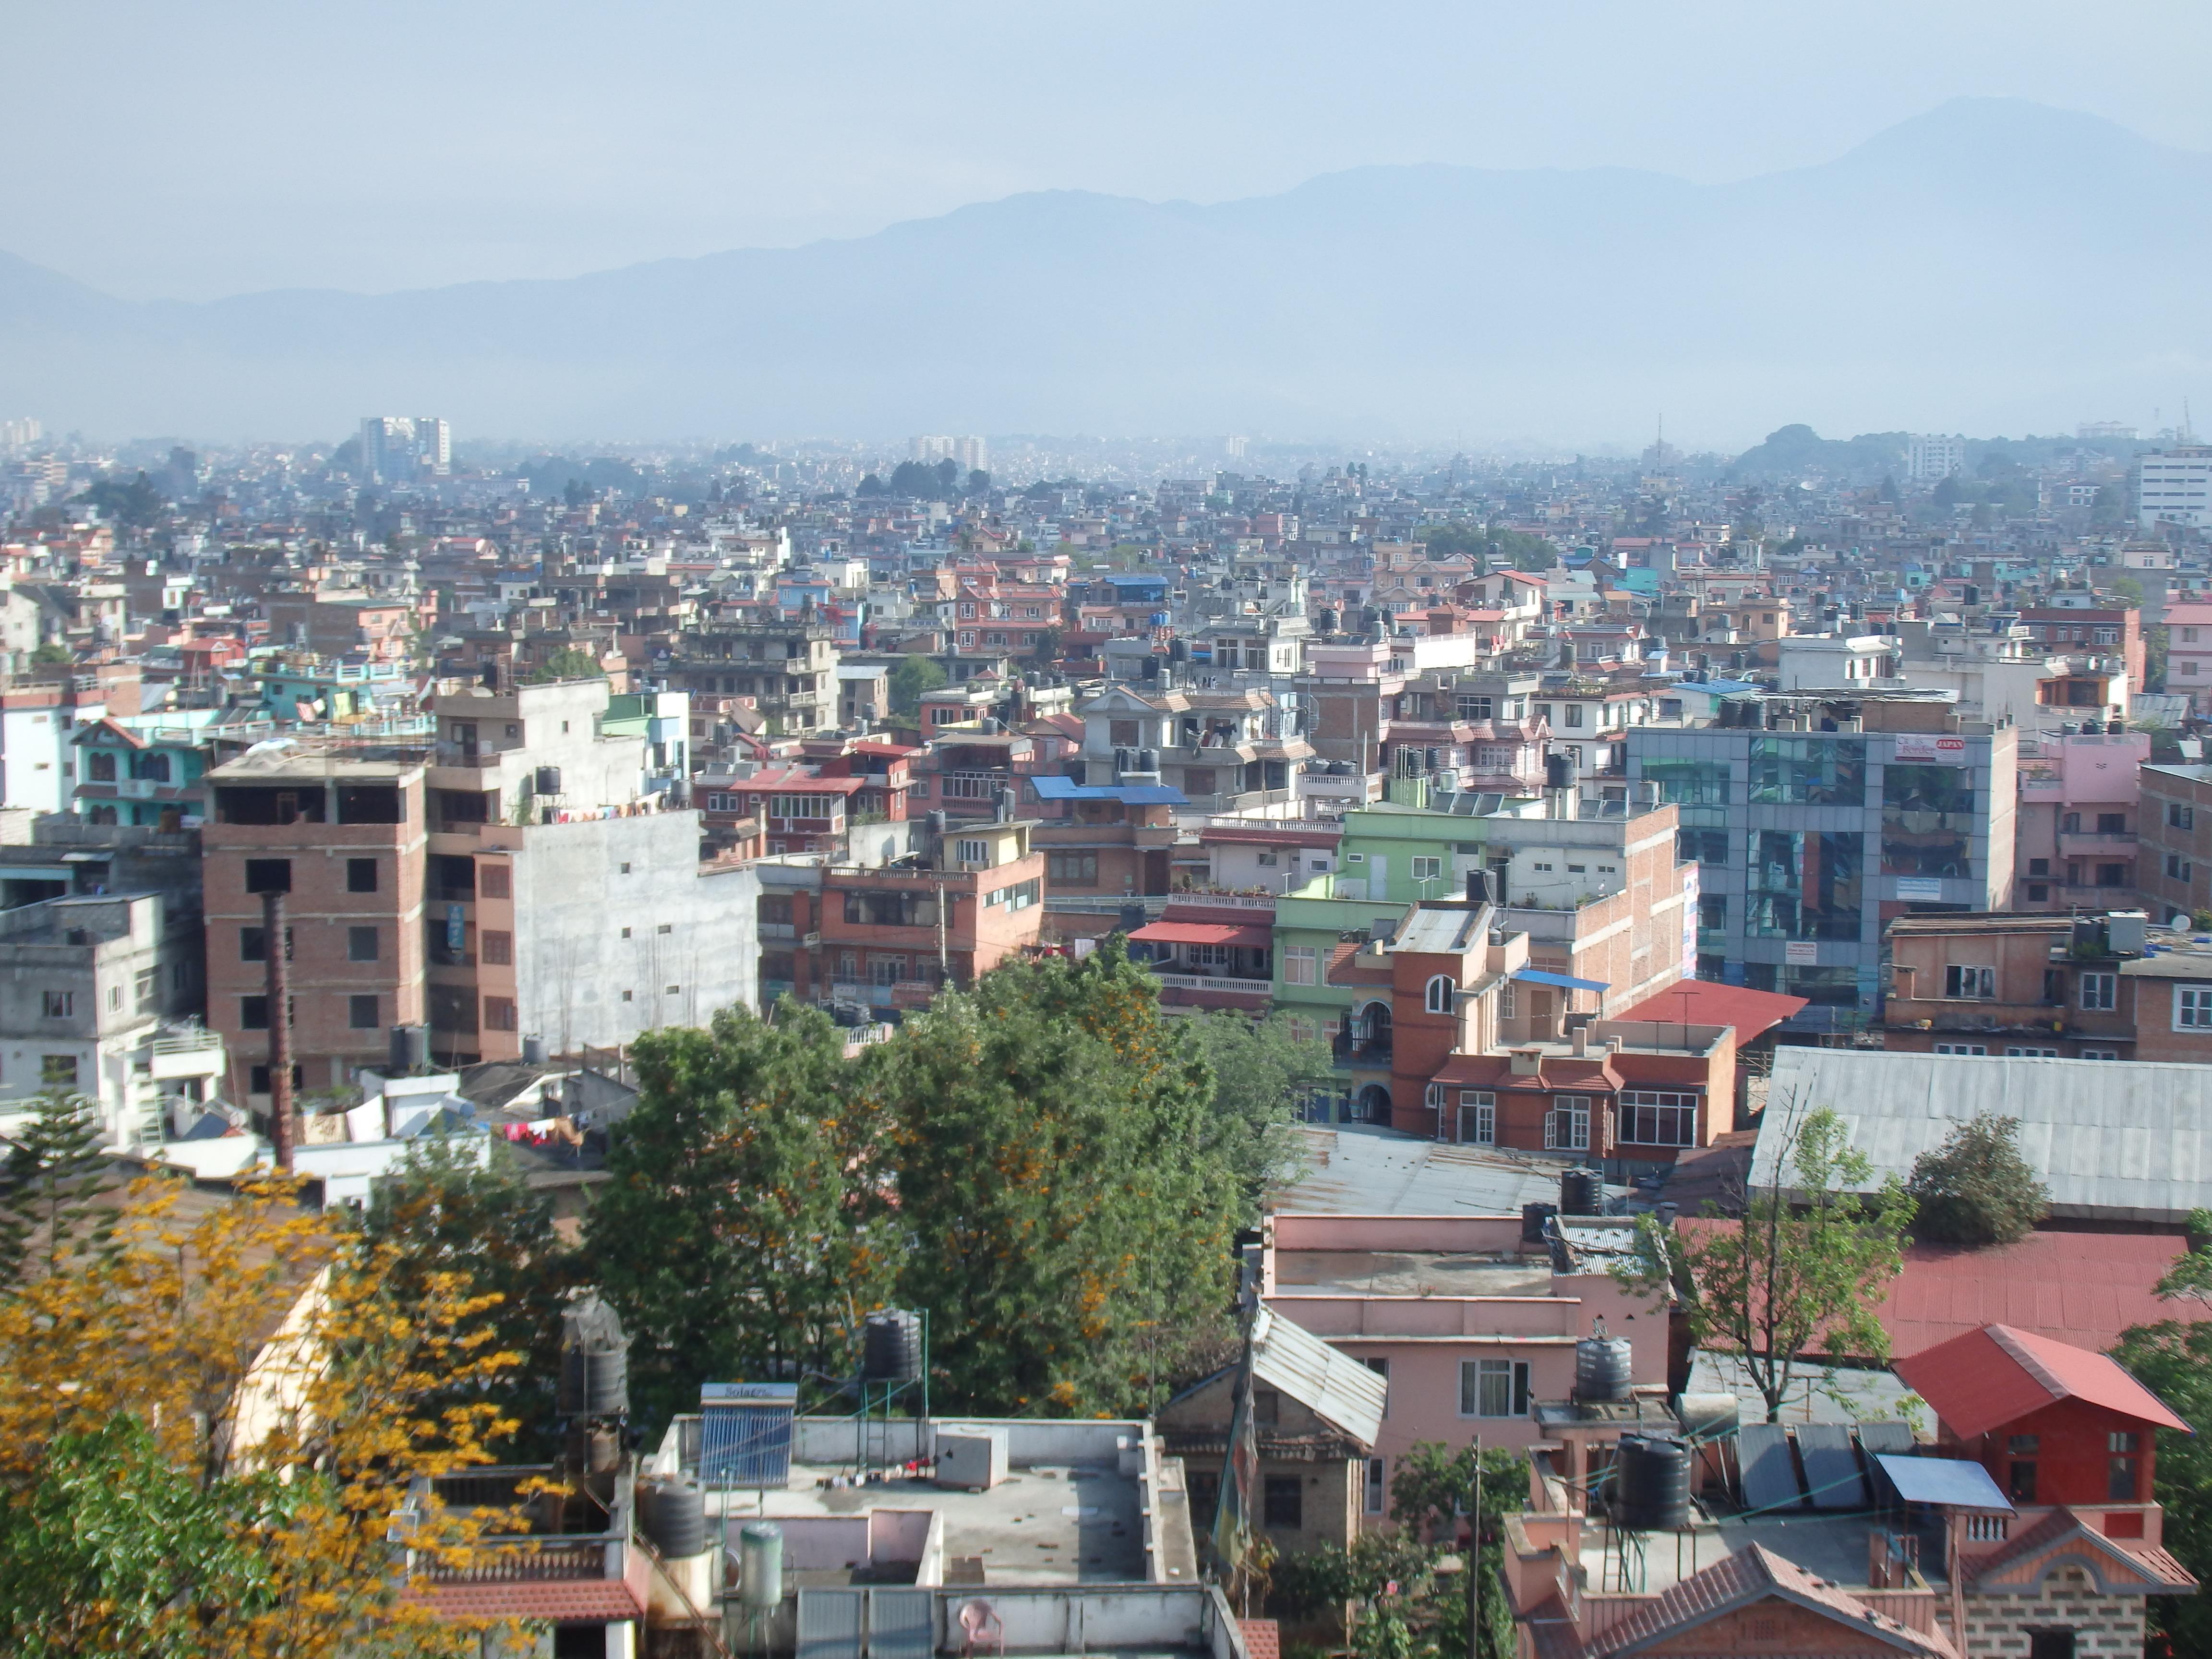 Bogati_Tol%2C_Kathmandu_44600%2C_Nepal_-_panoramio.jpg